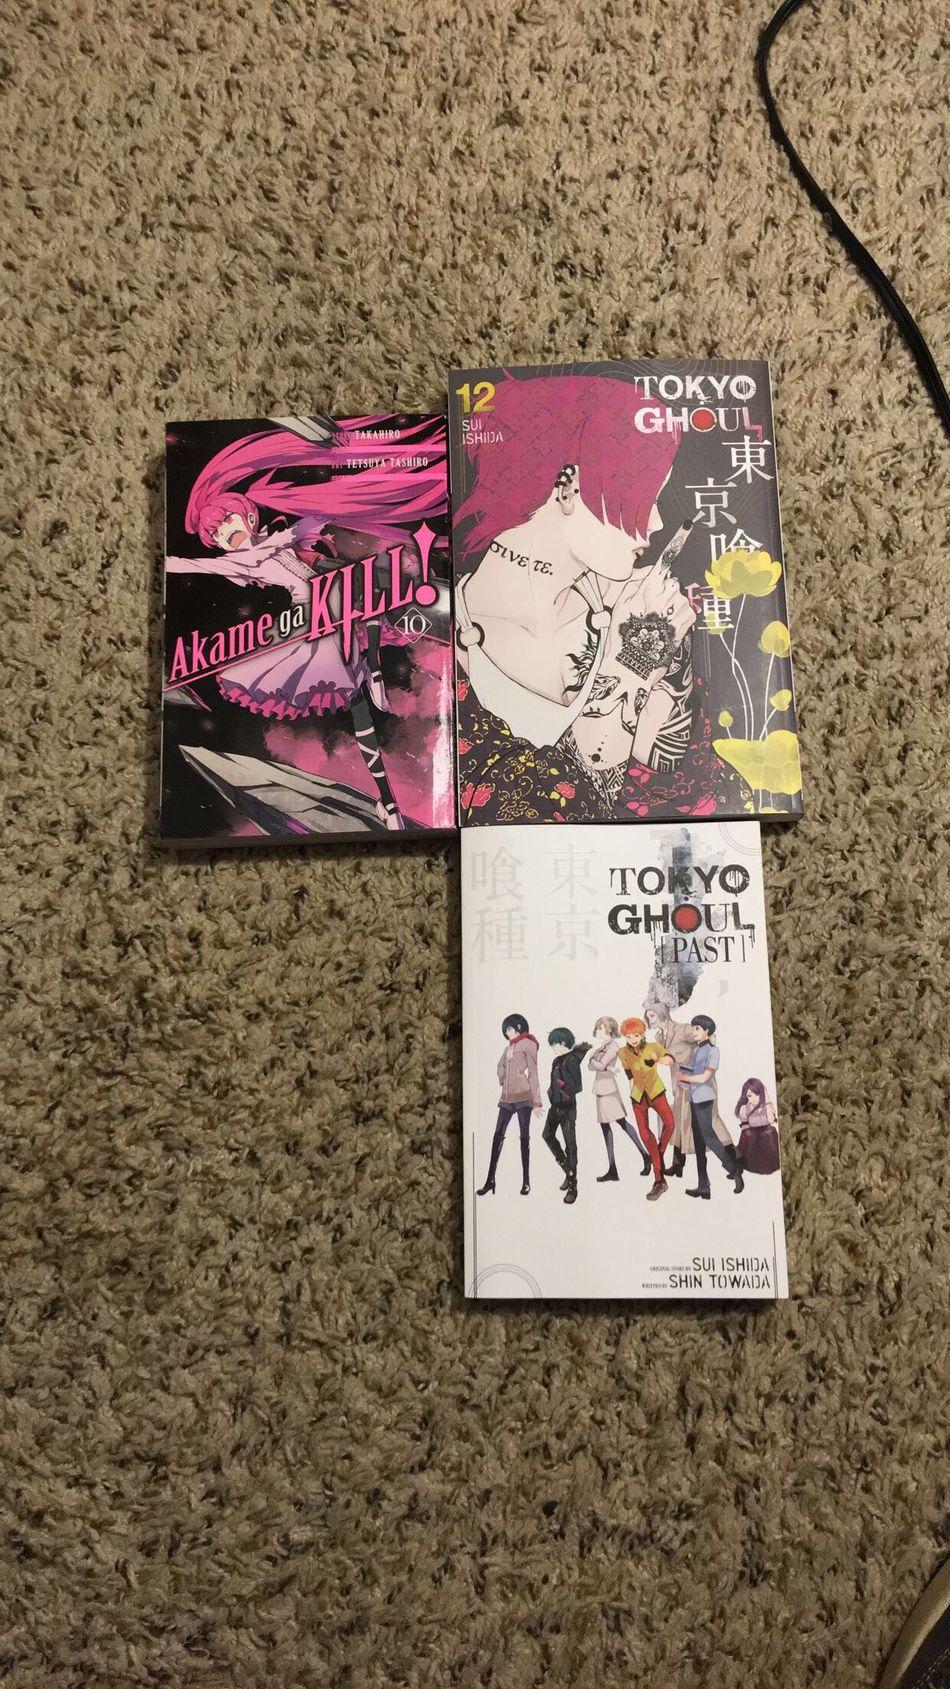 Manga Akame Ga Kill Akamegakill Akame Ga Kill! Tokyoghoul Tokyo Ghoul